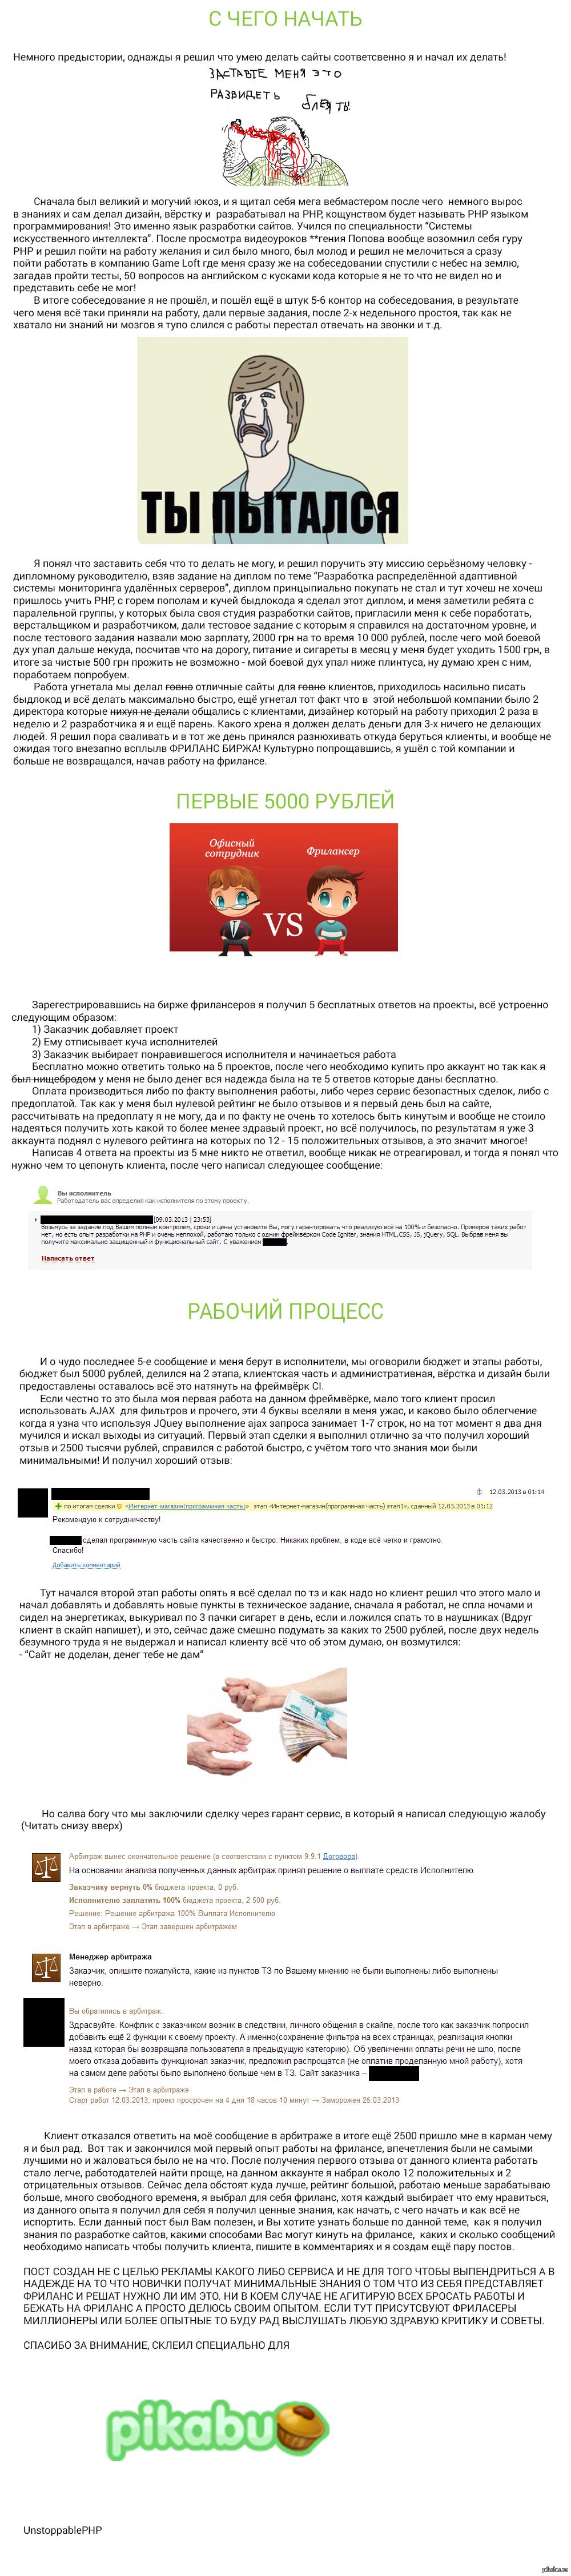 Php фриланс как начать what is a freelance professional photographer